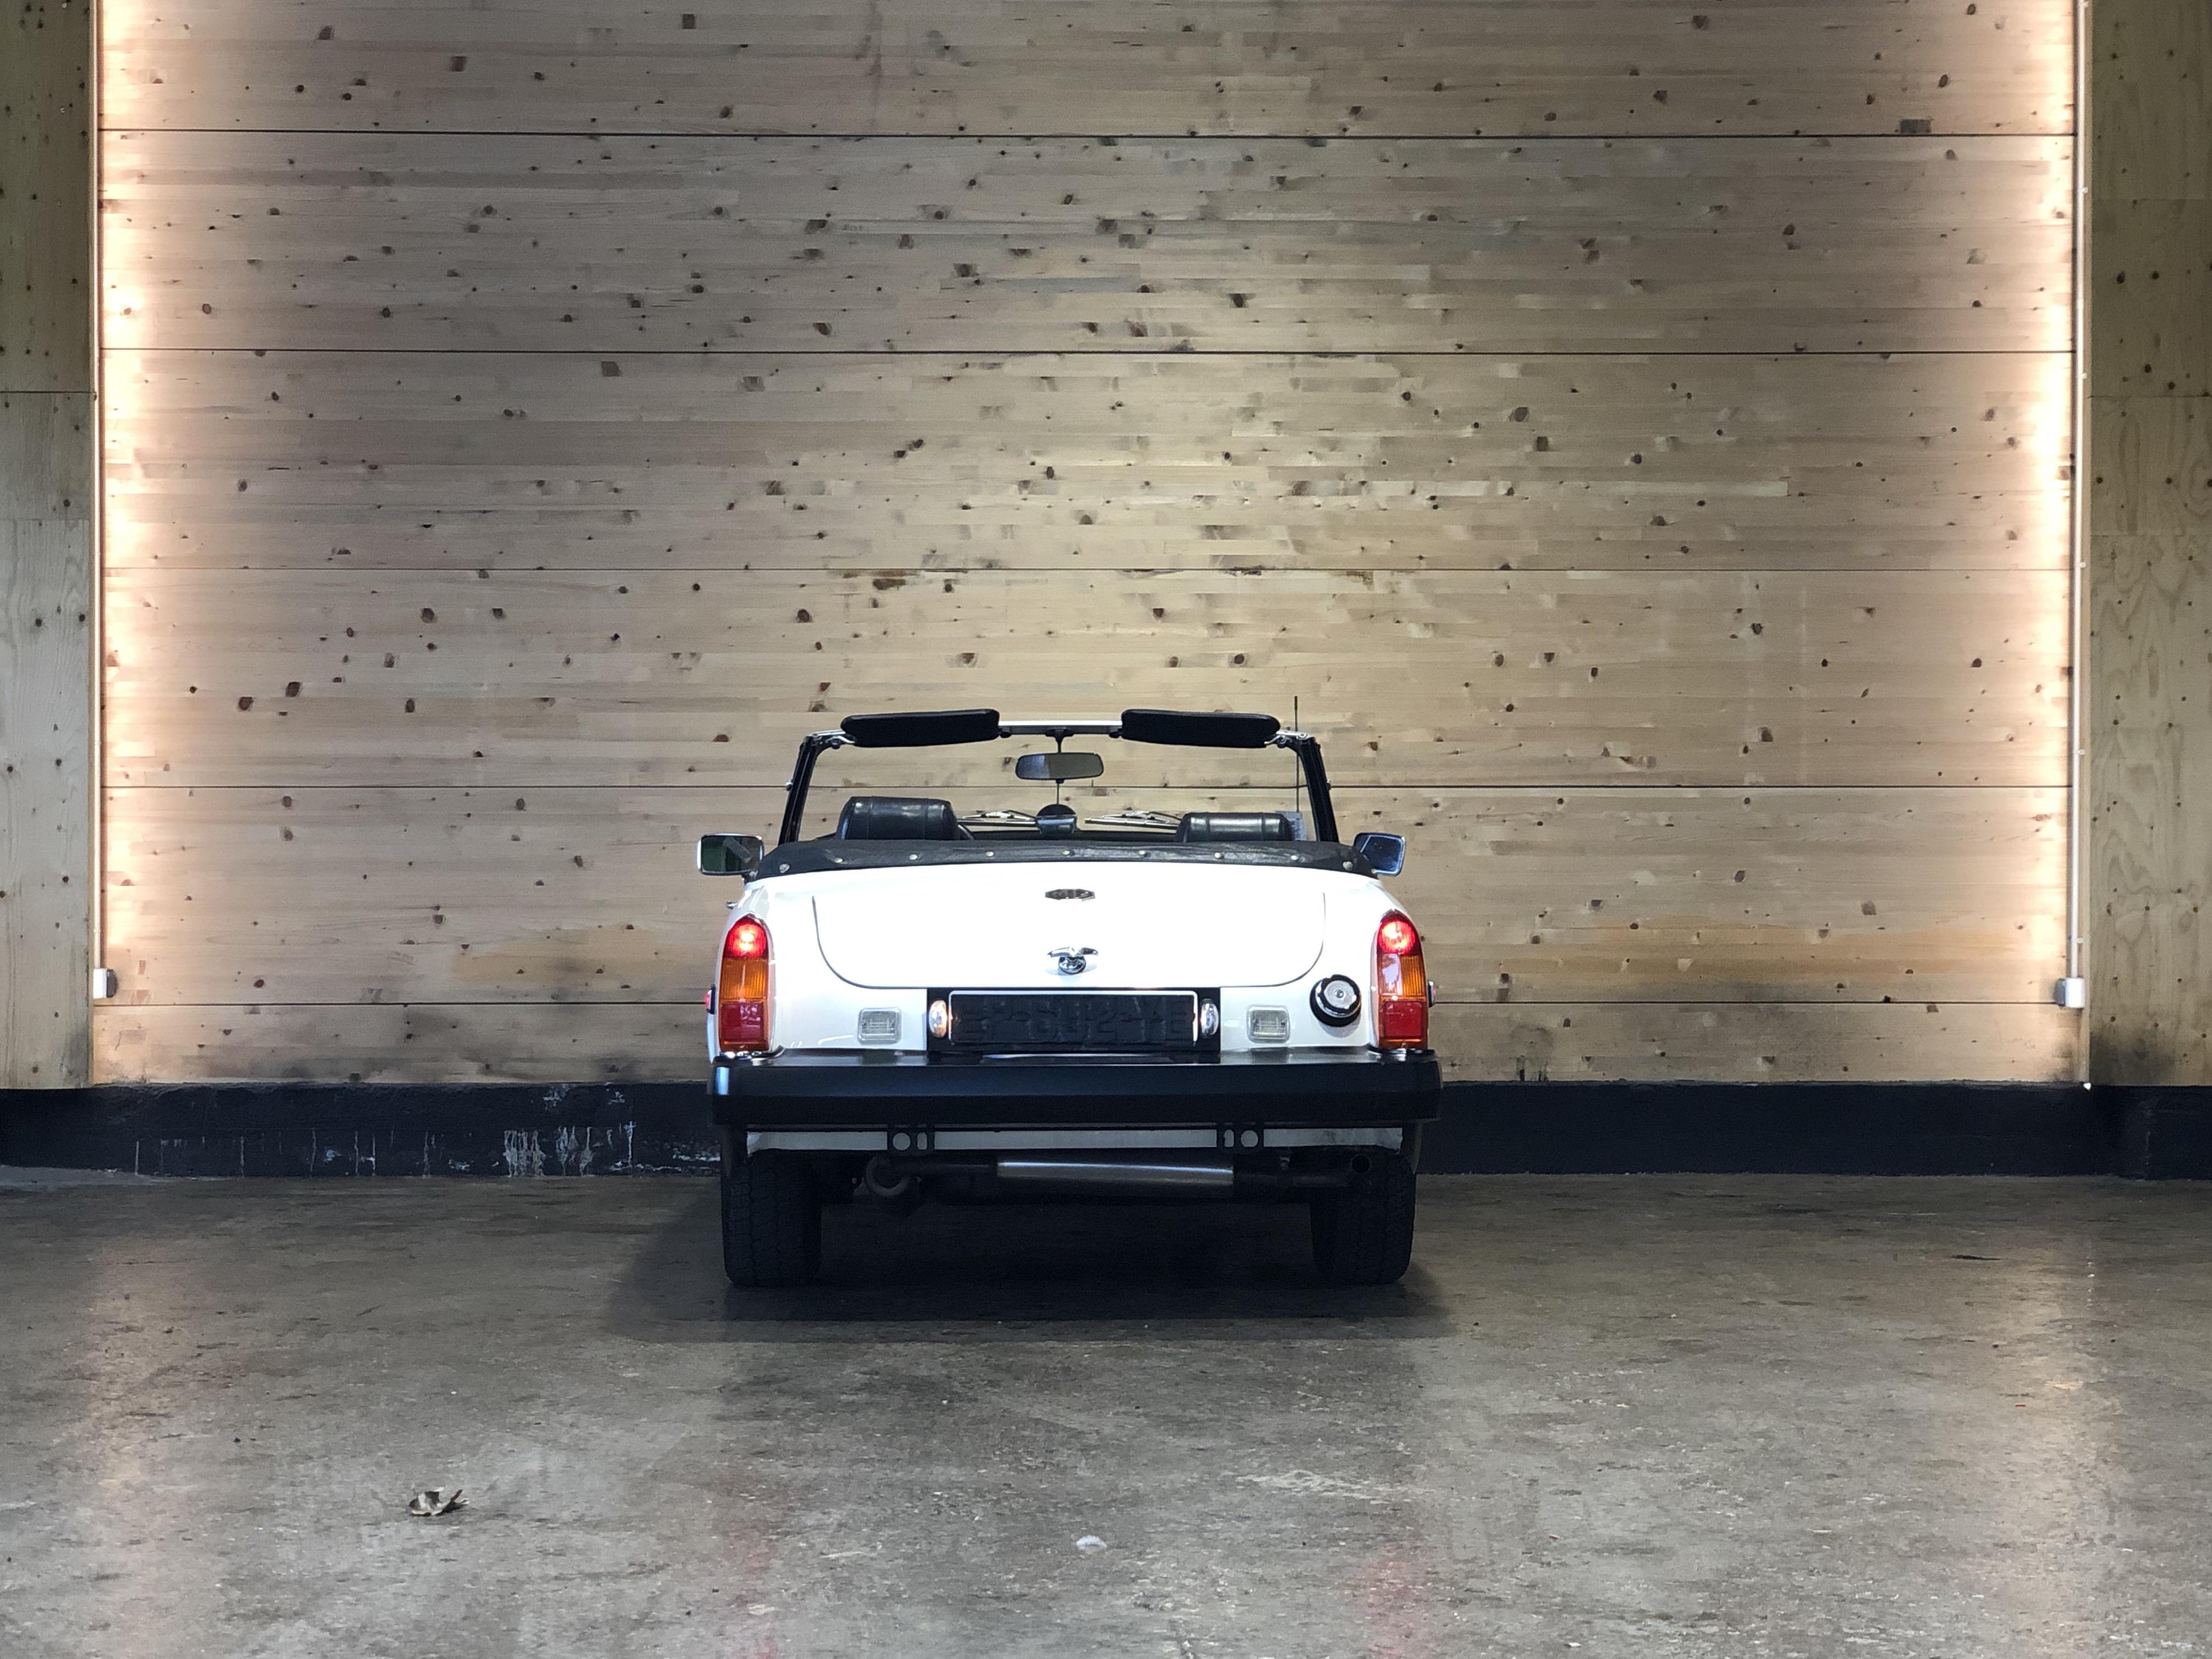 MG Midget 1500